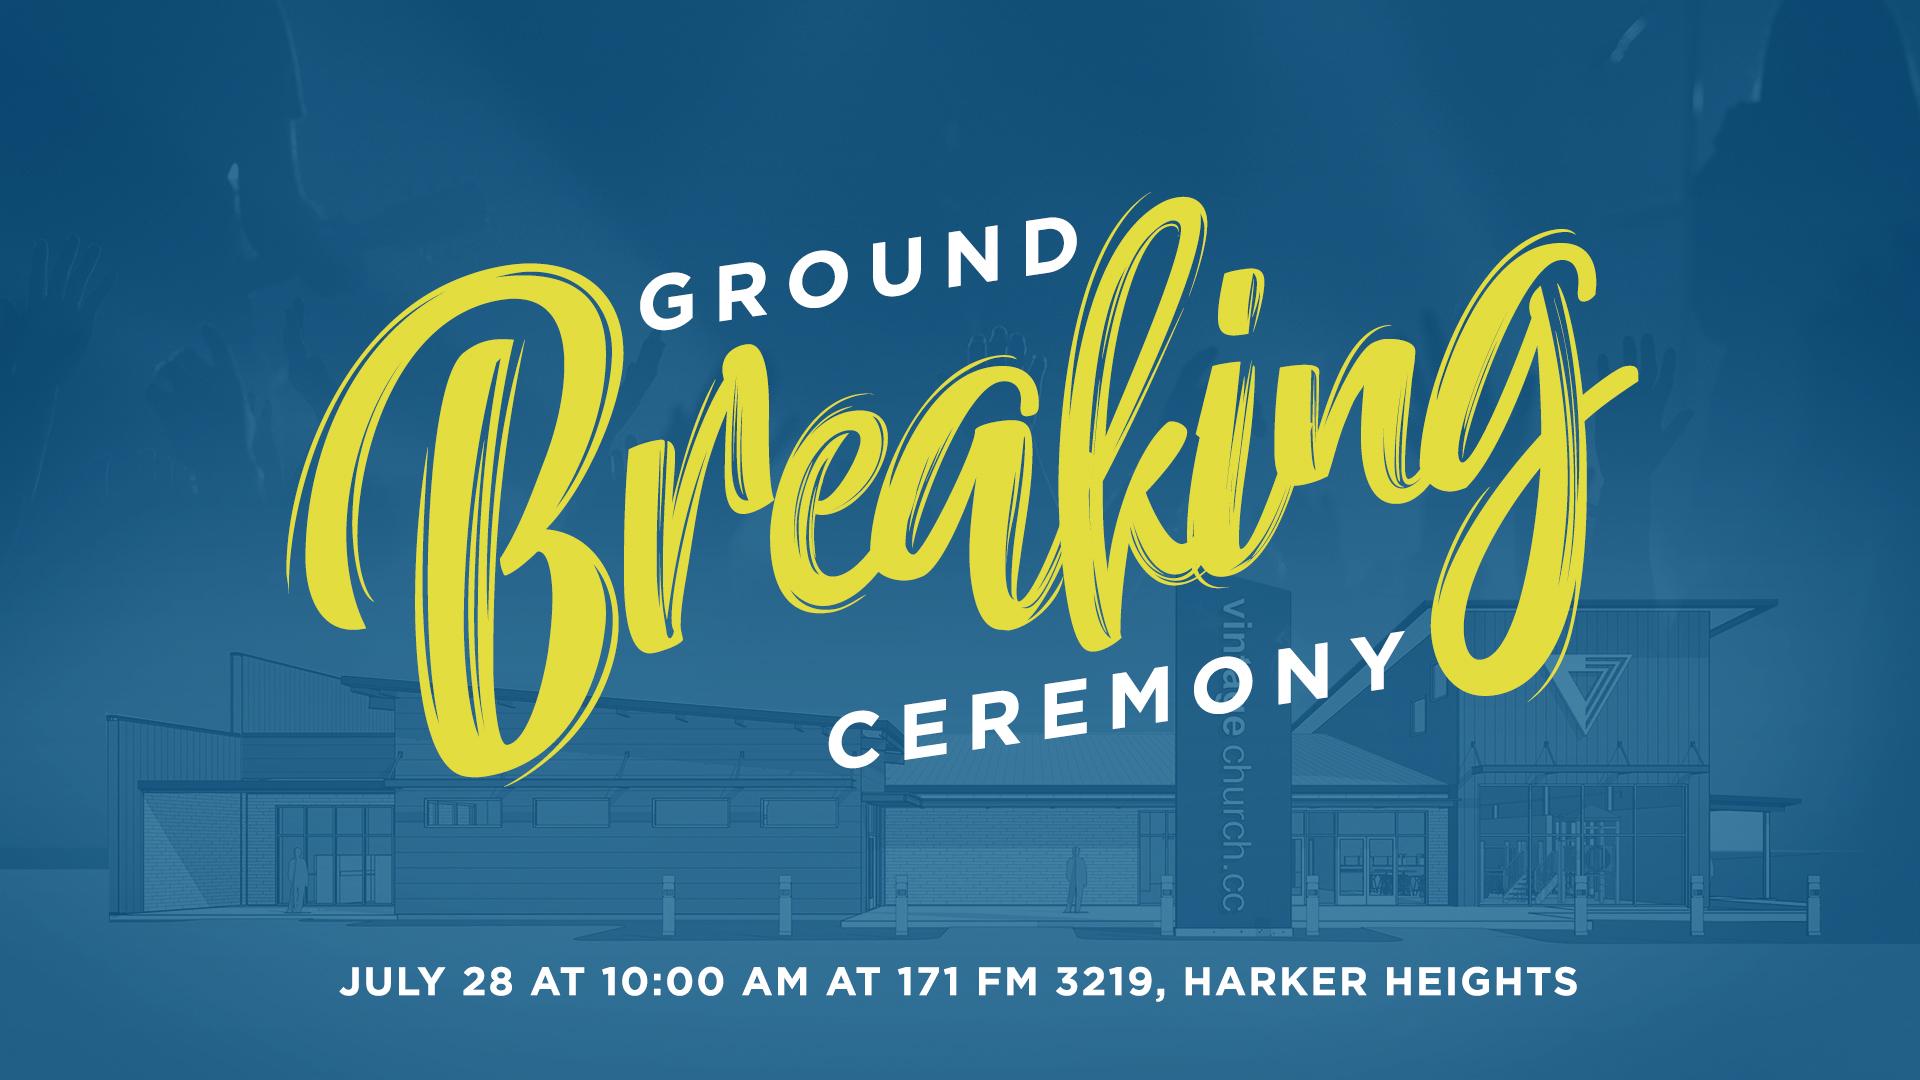 Ground Breaking Ceremony - Key Art.jpg